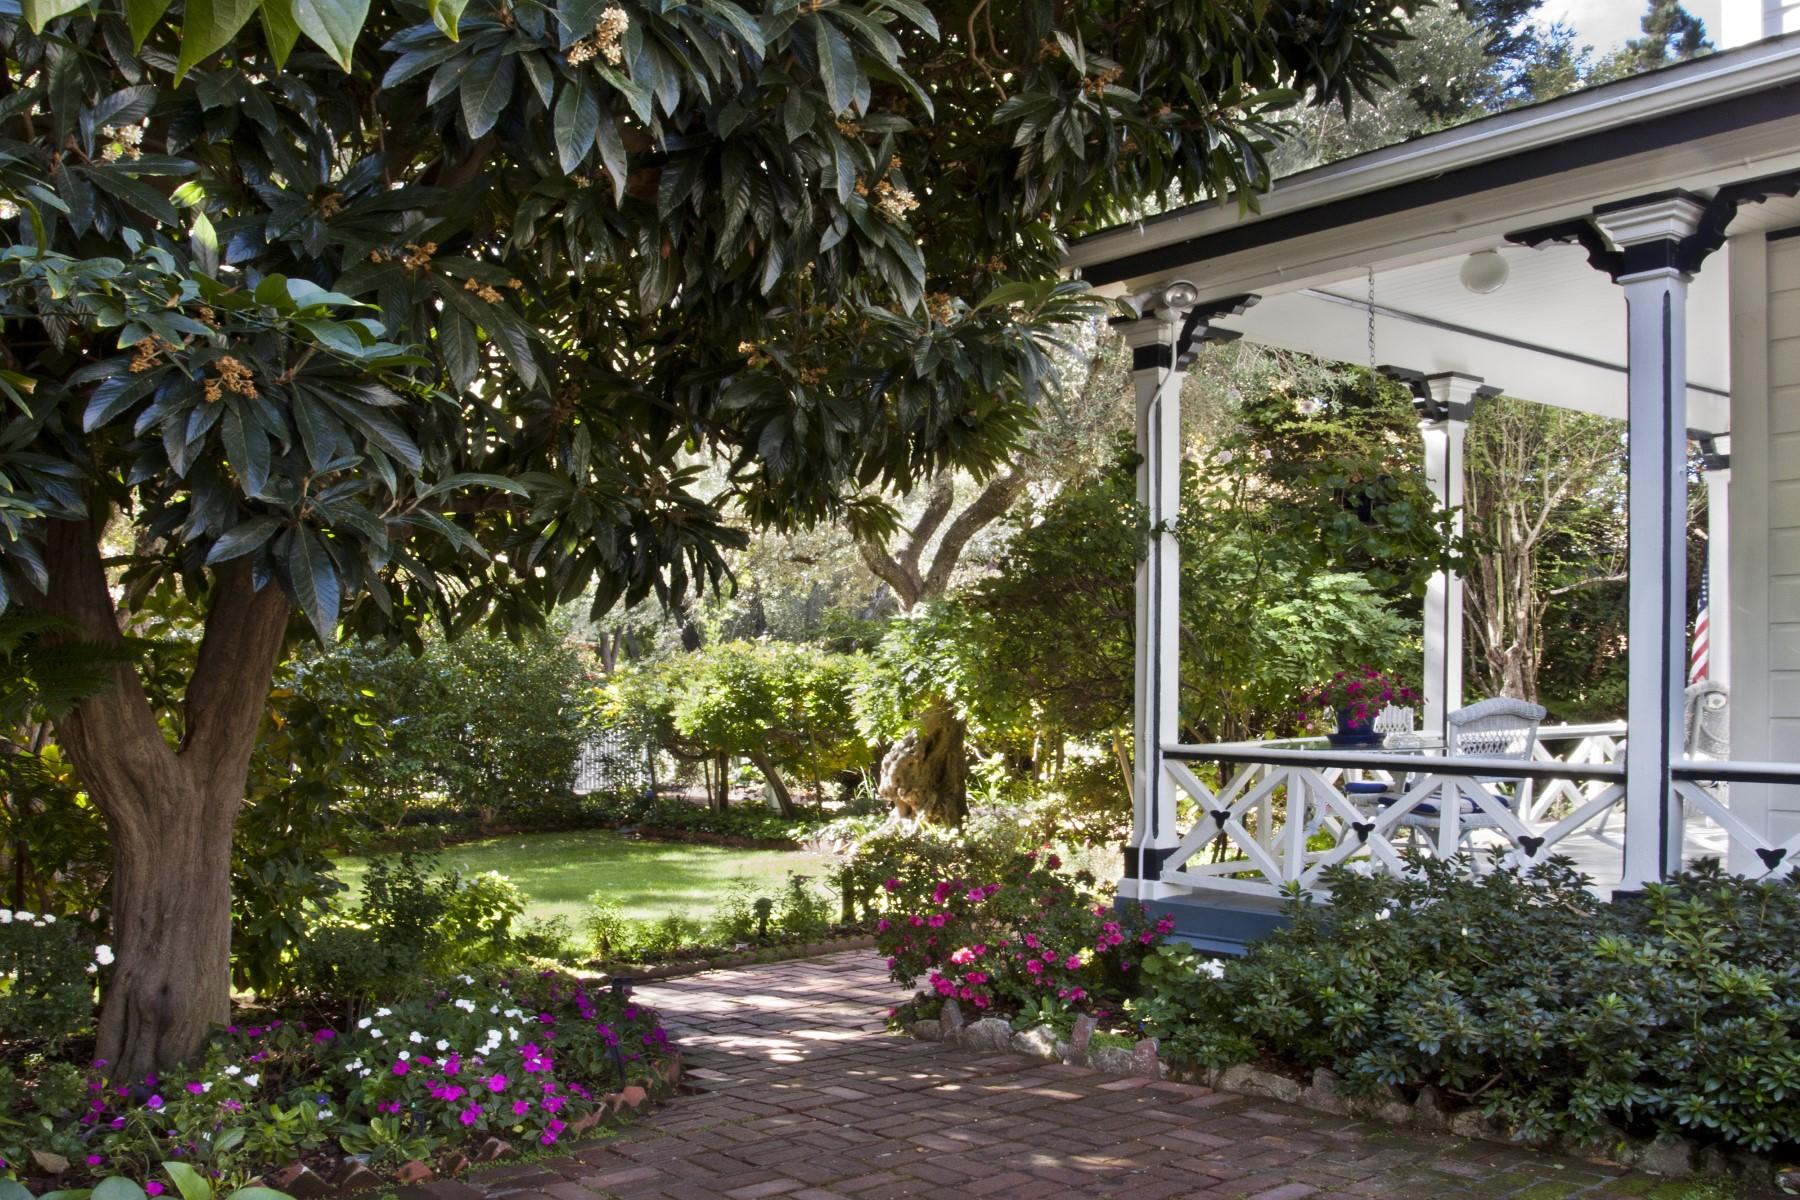 Single Family Home for Sale at Downtown Sonoma Victorian 316 E Napa St Sonoma, California 95476 United States